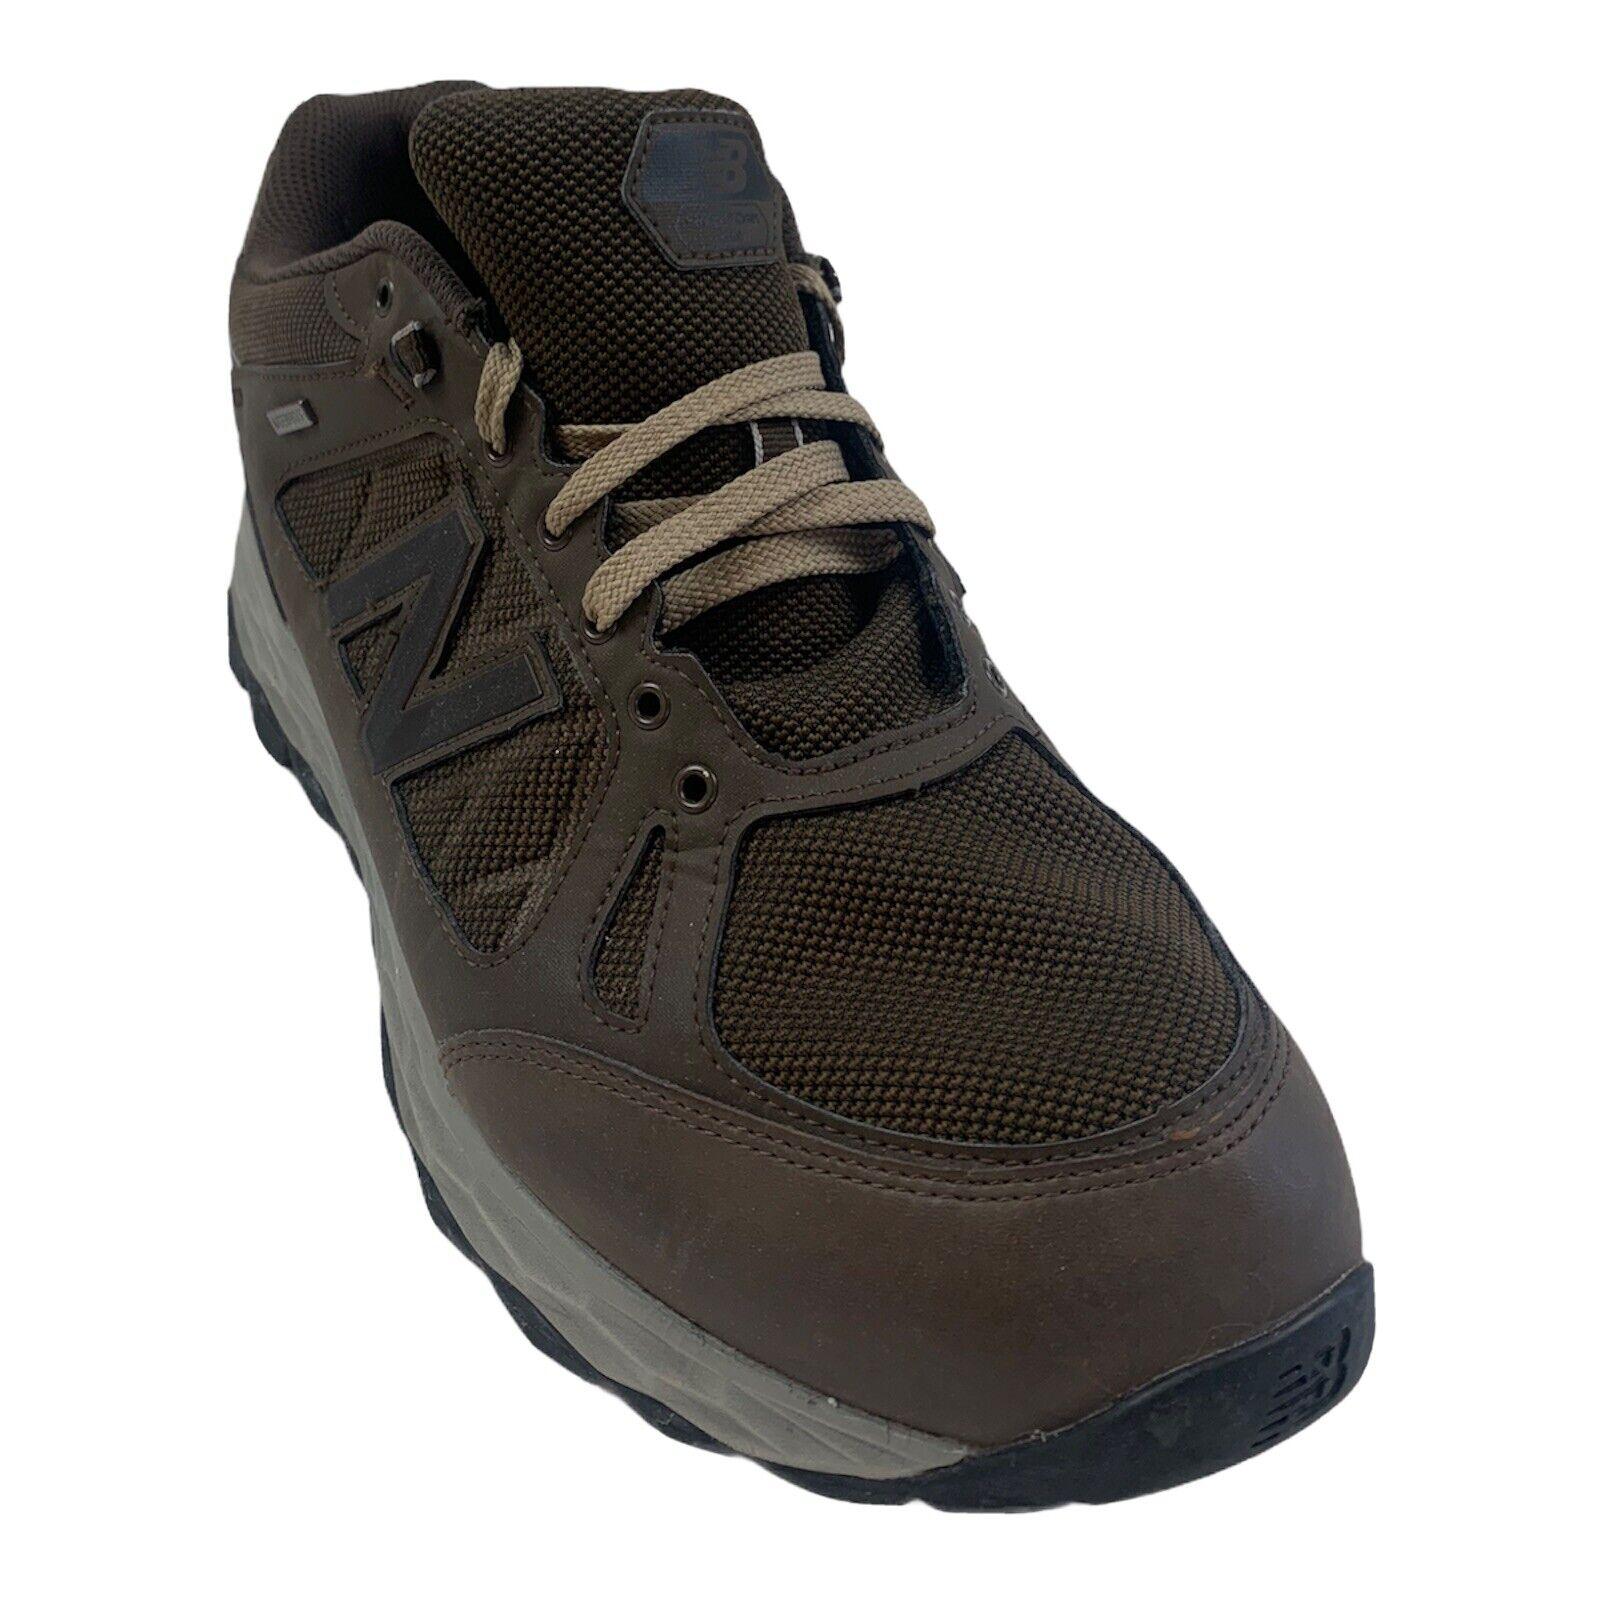 New Balance 1350 Brown Low Top Hiking Walking MW1350WC Men's Size 14 4E